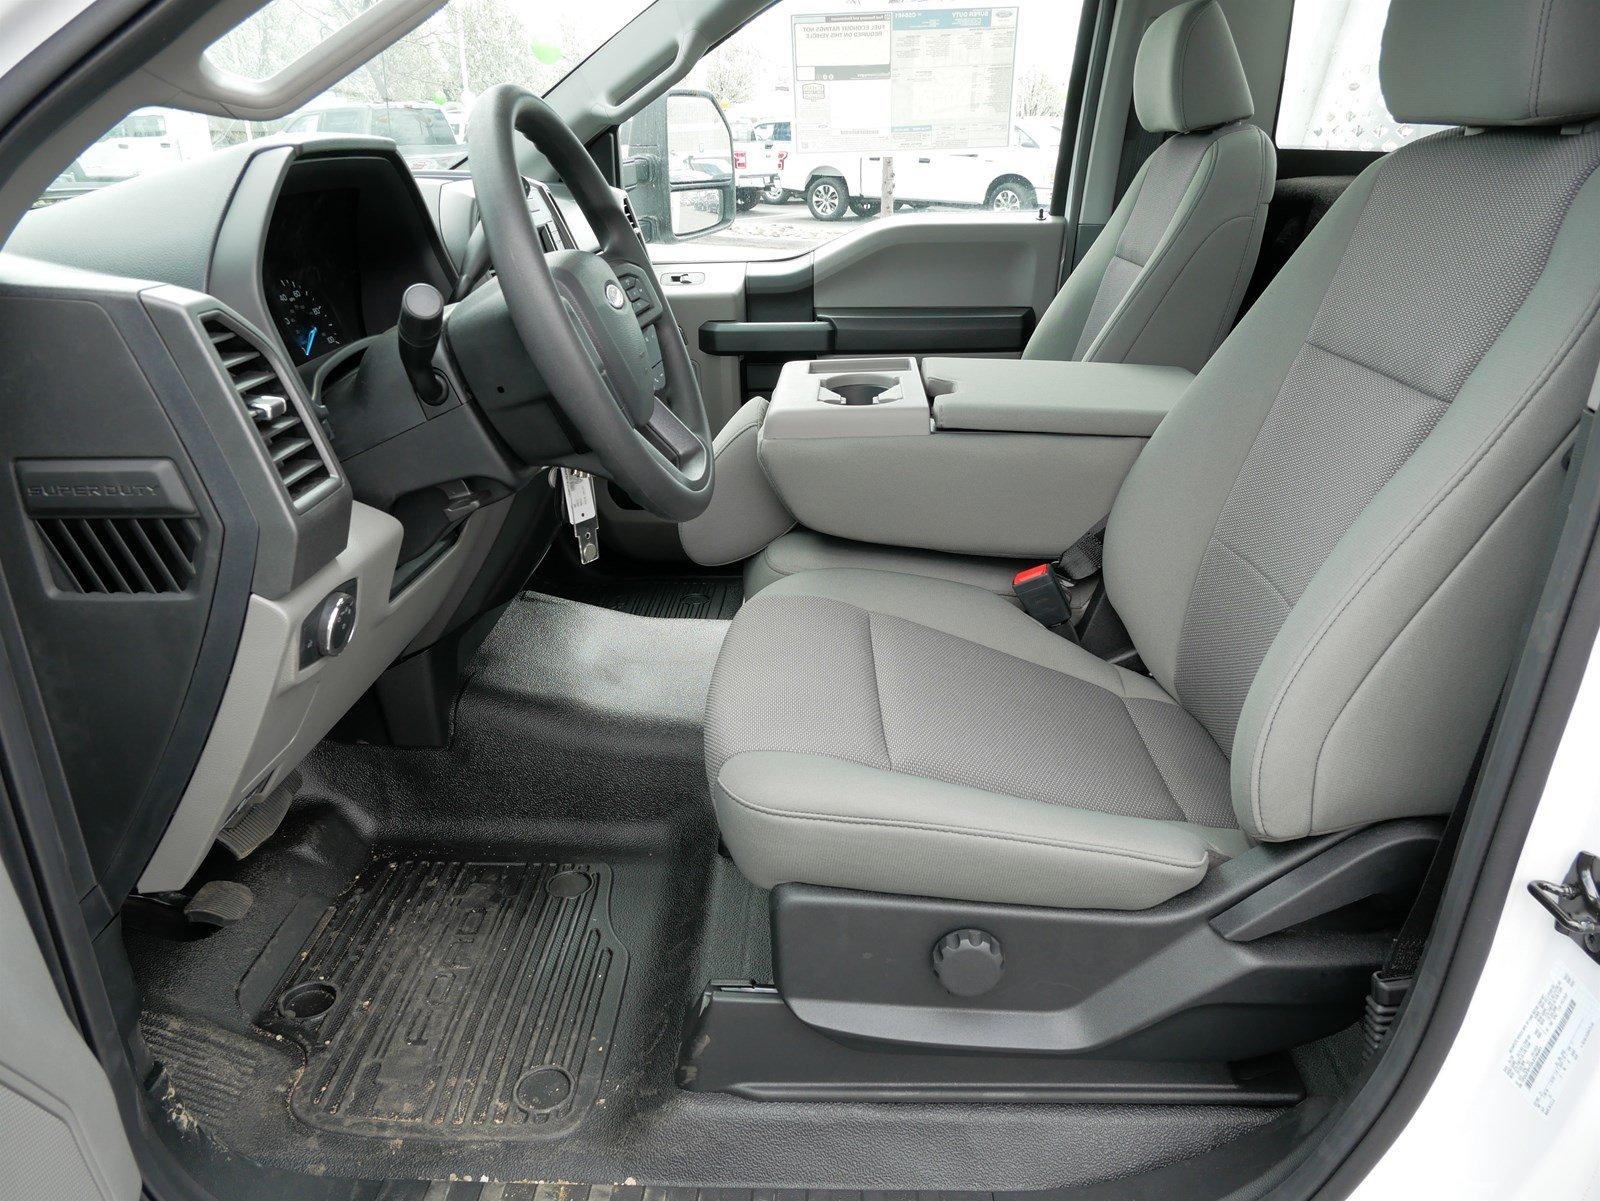 2020 F-550 Regular Cab DRW 4x4, Scelzi CTFB Contractor Body #63090 - photo 18